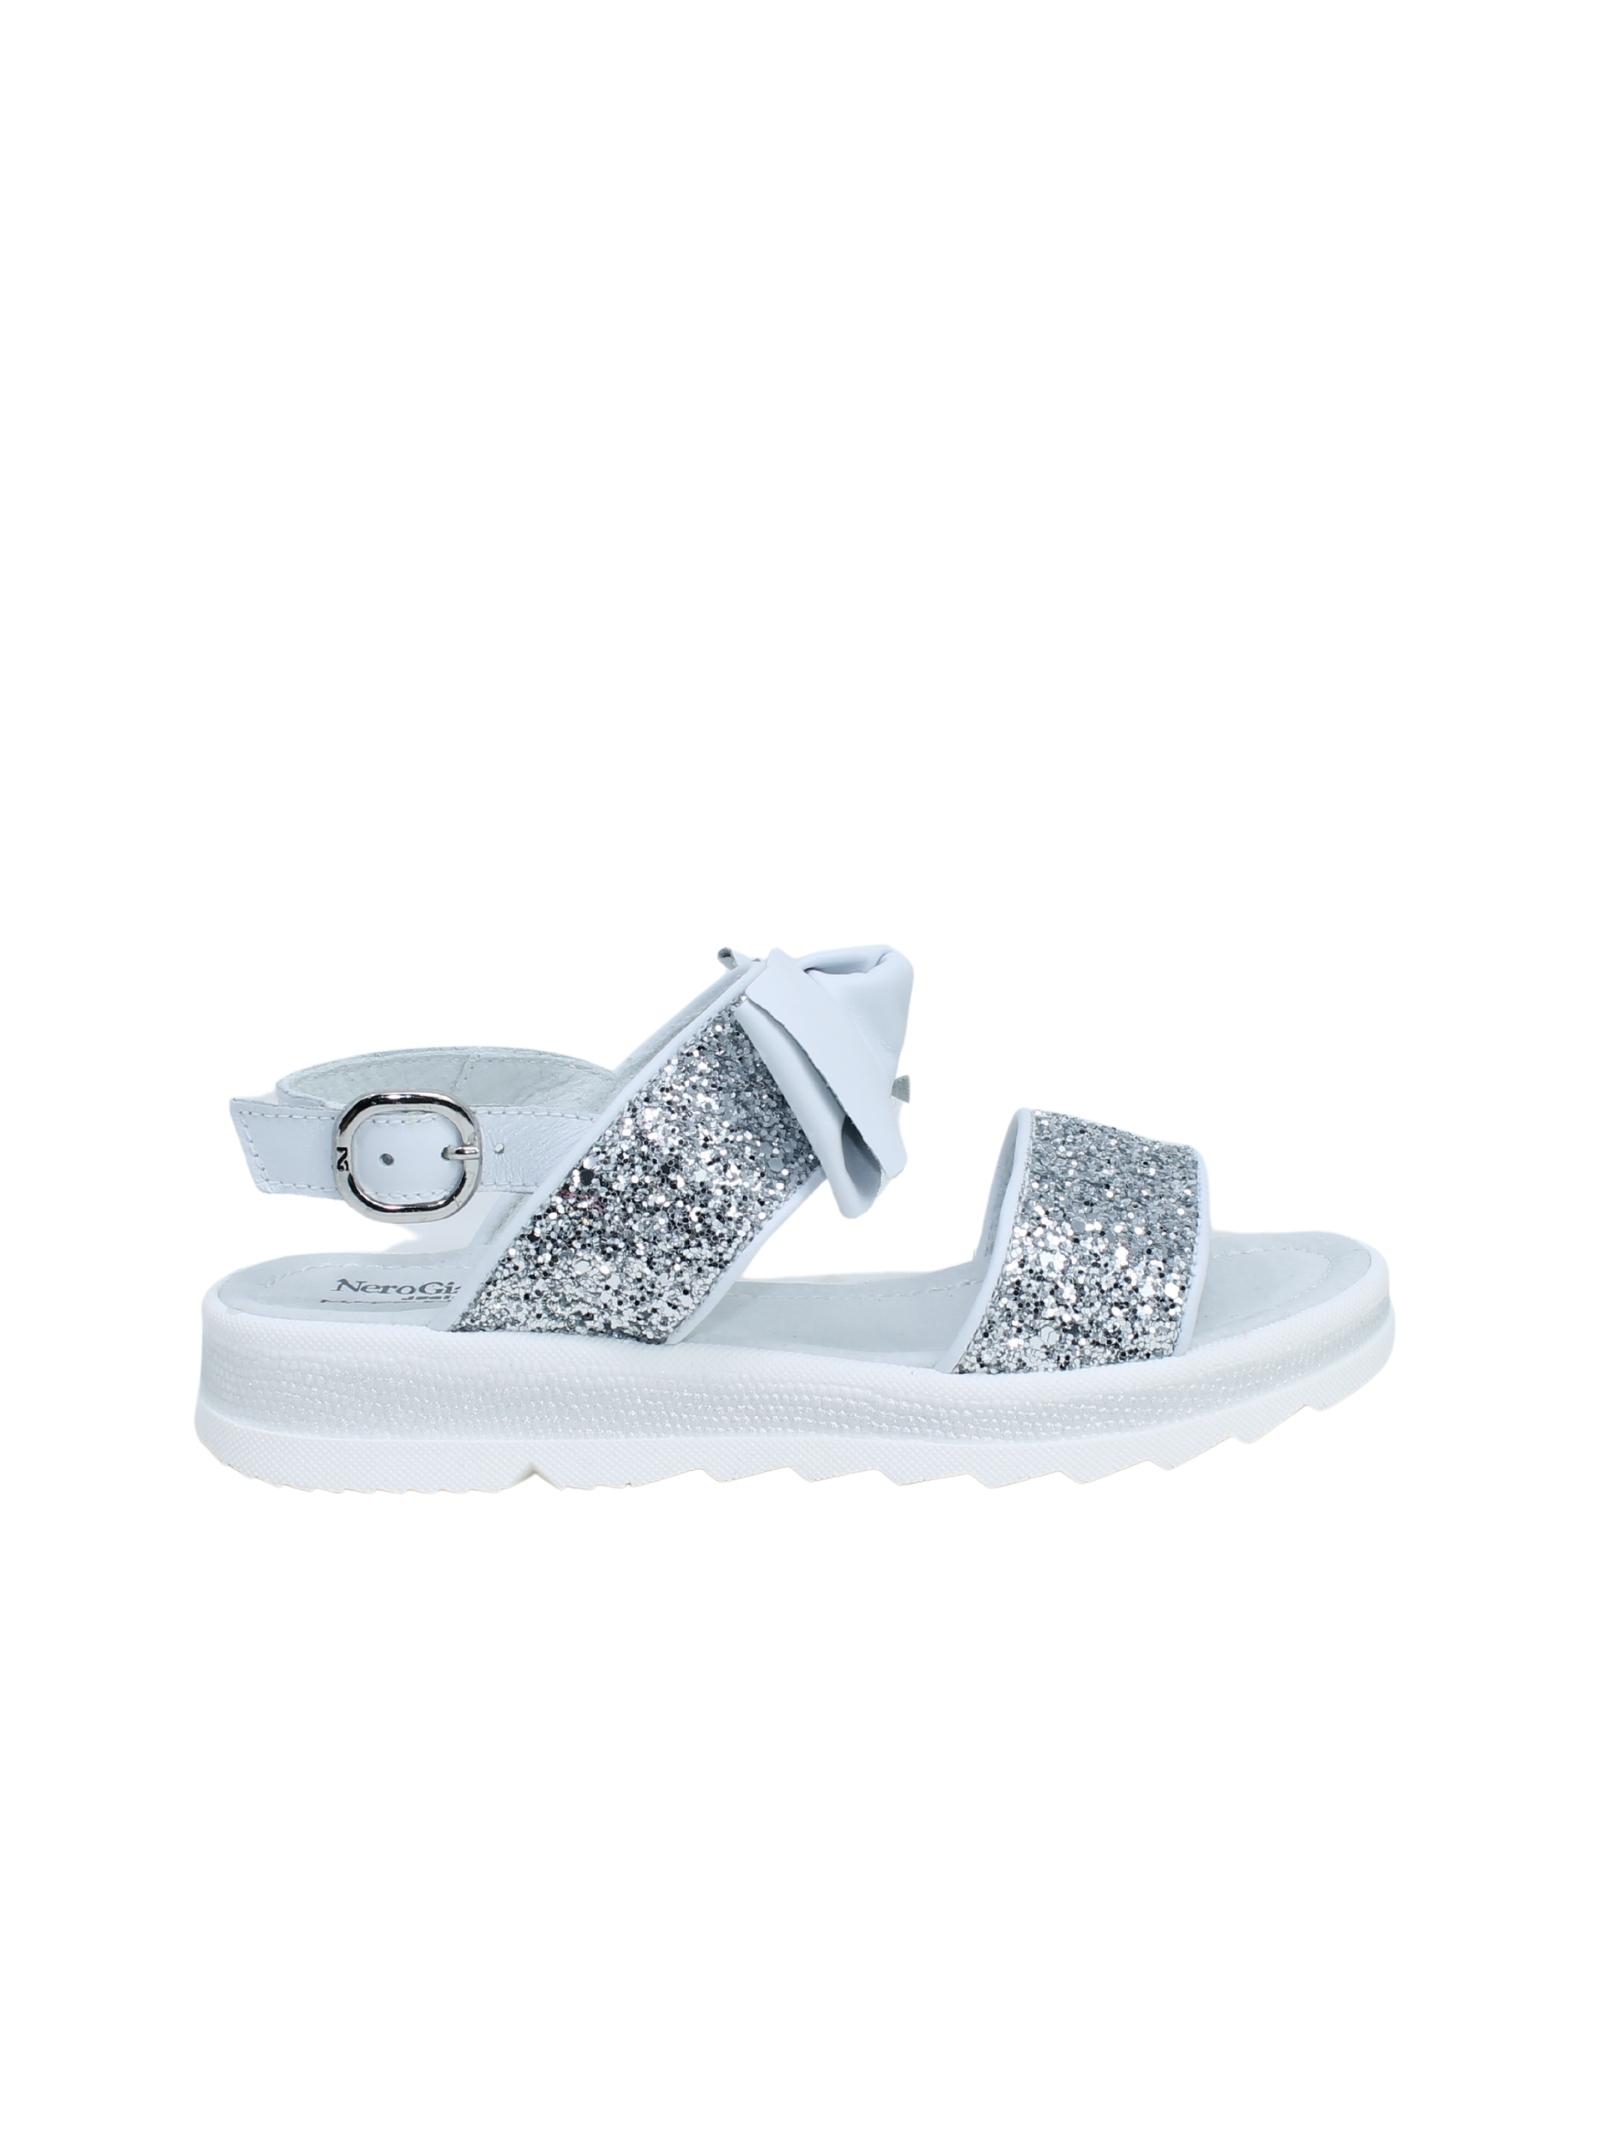 Sandalo Bambina Glitter, NERO GIARDINI JUNIOR | Sandali | E031600F700